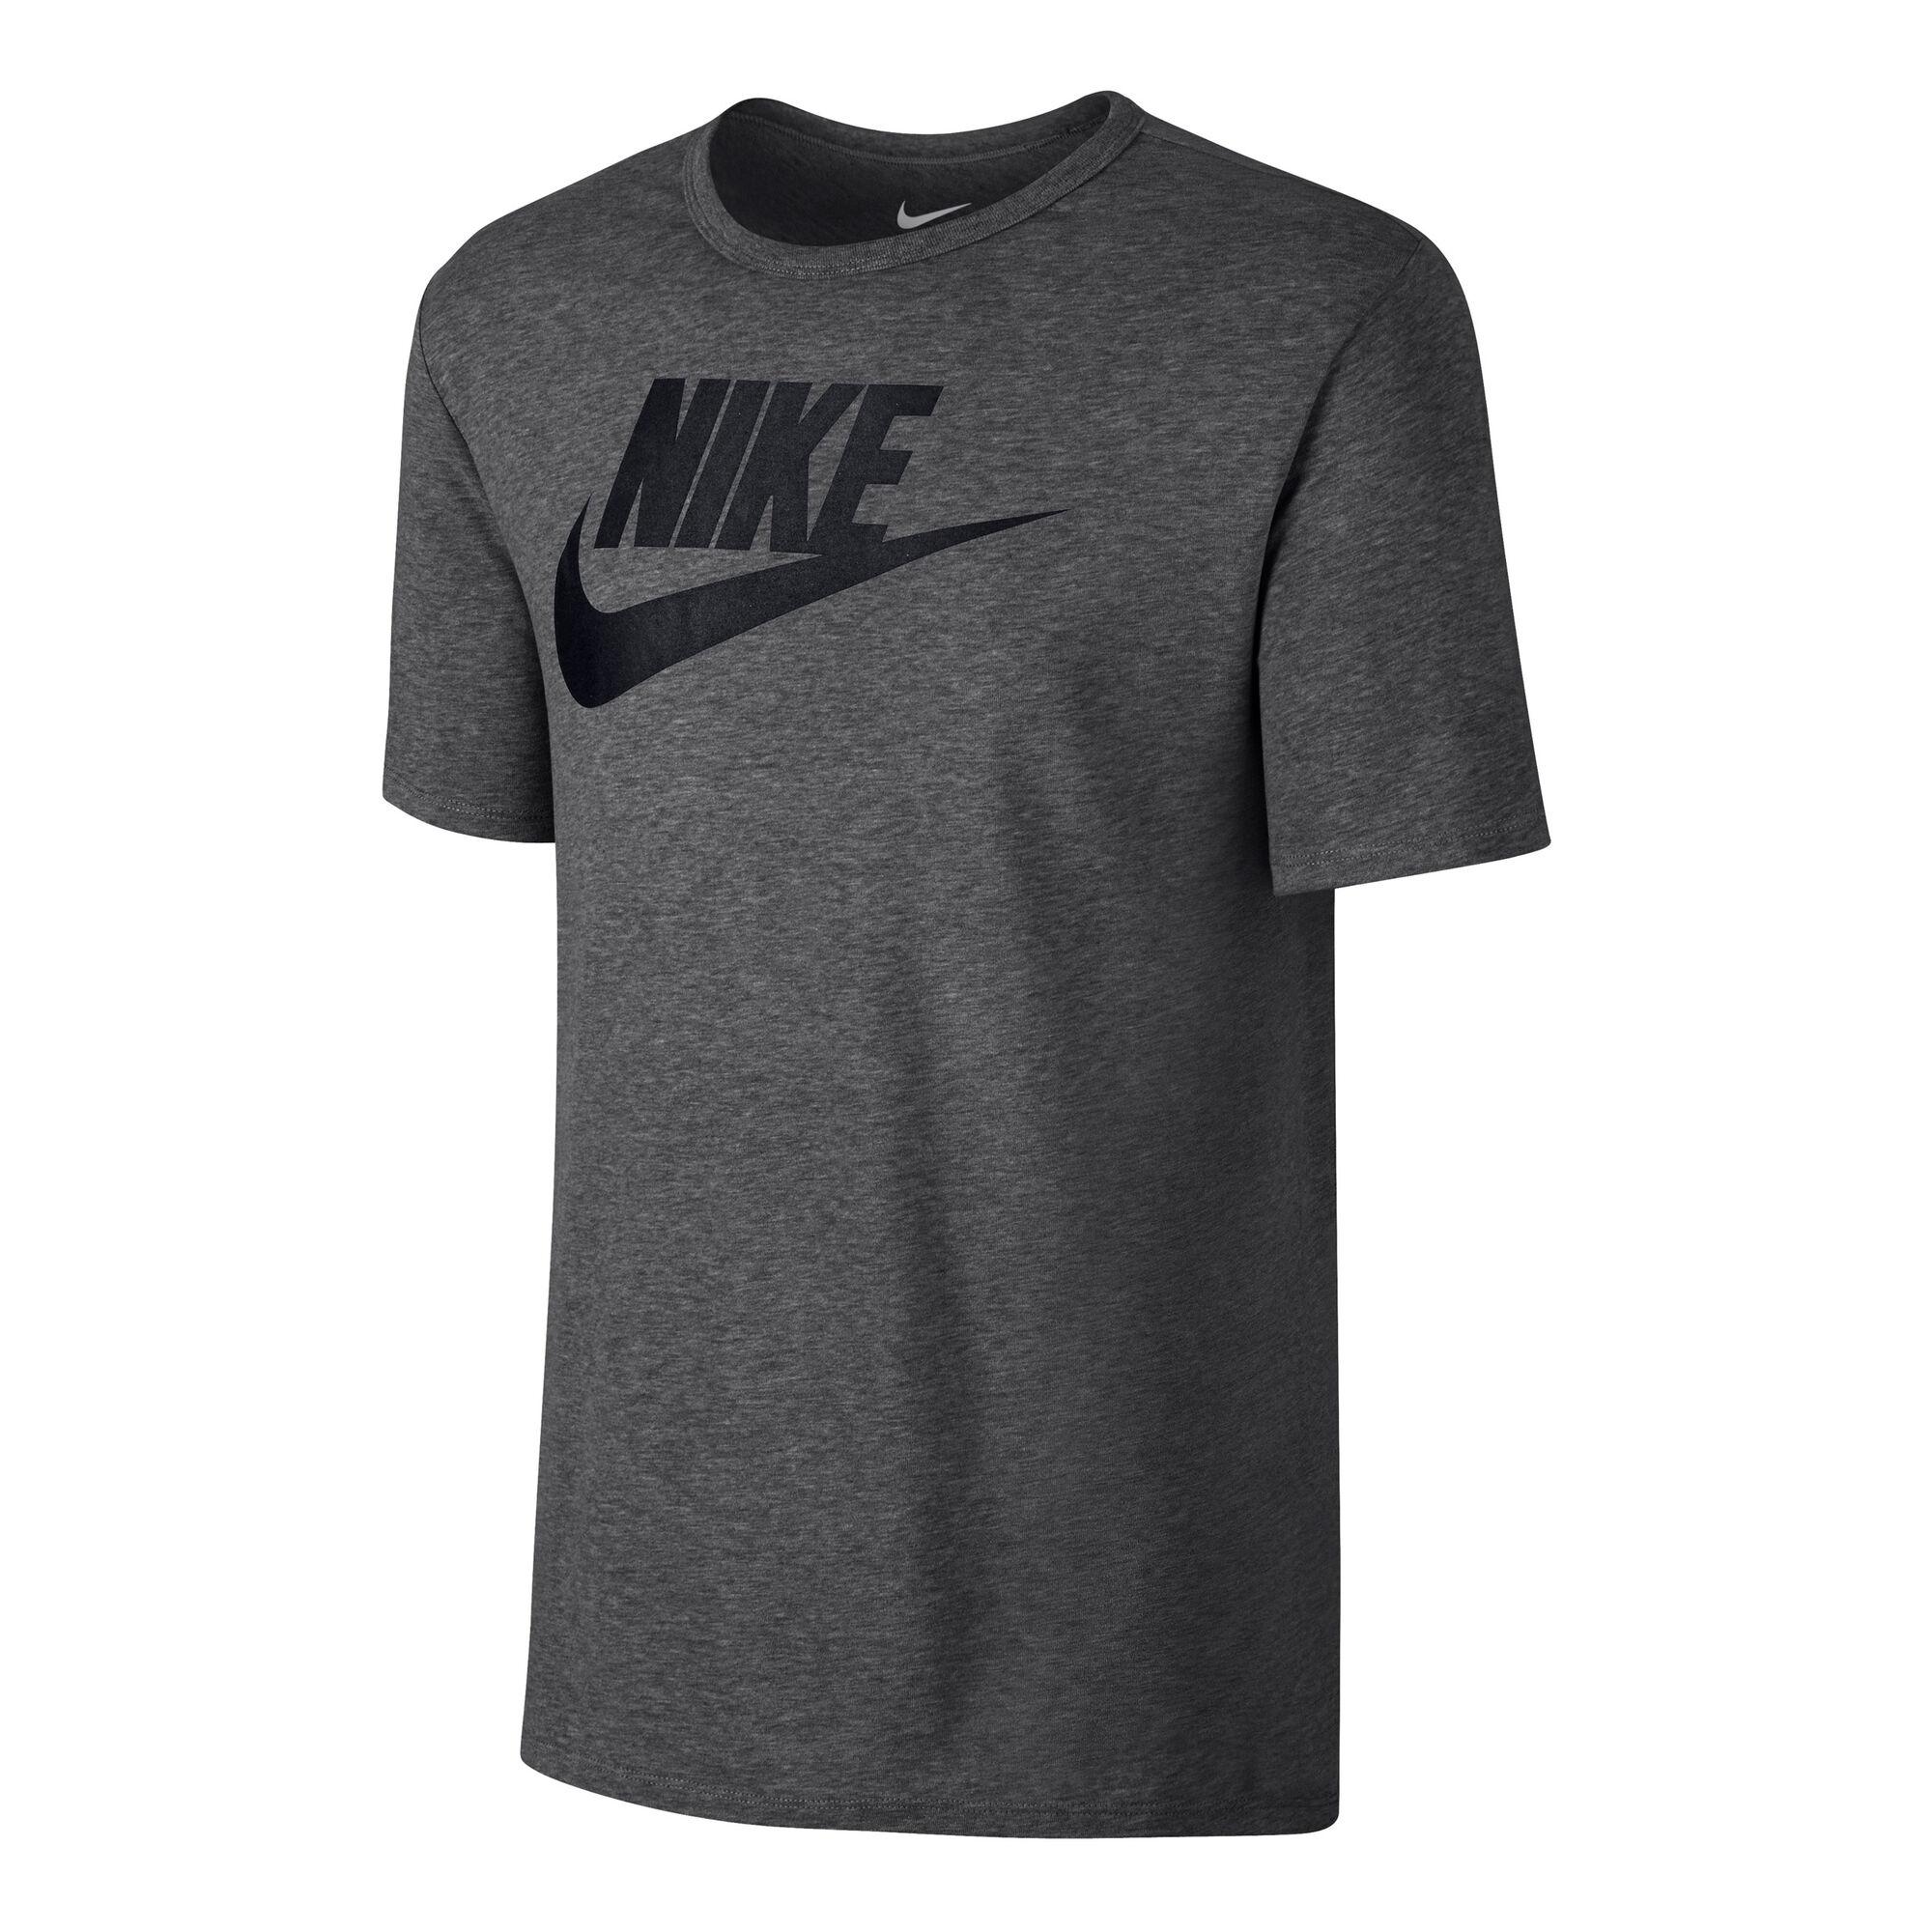 huge discount 826f0 b4c98 Nike Sportswear Futura Icon T-Shirt Herren - Dunkelgrau, Schwarz ...